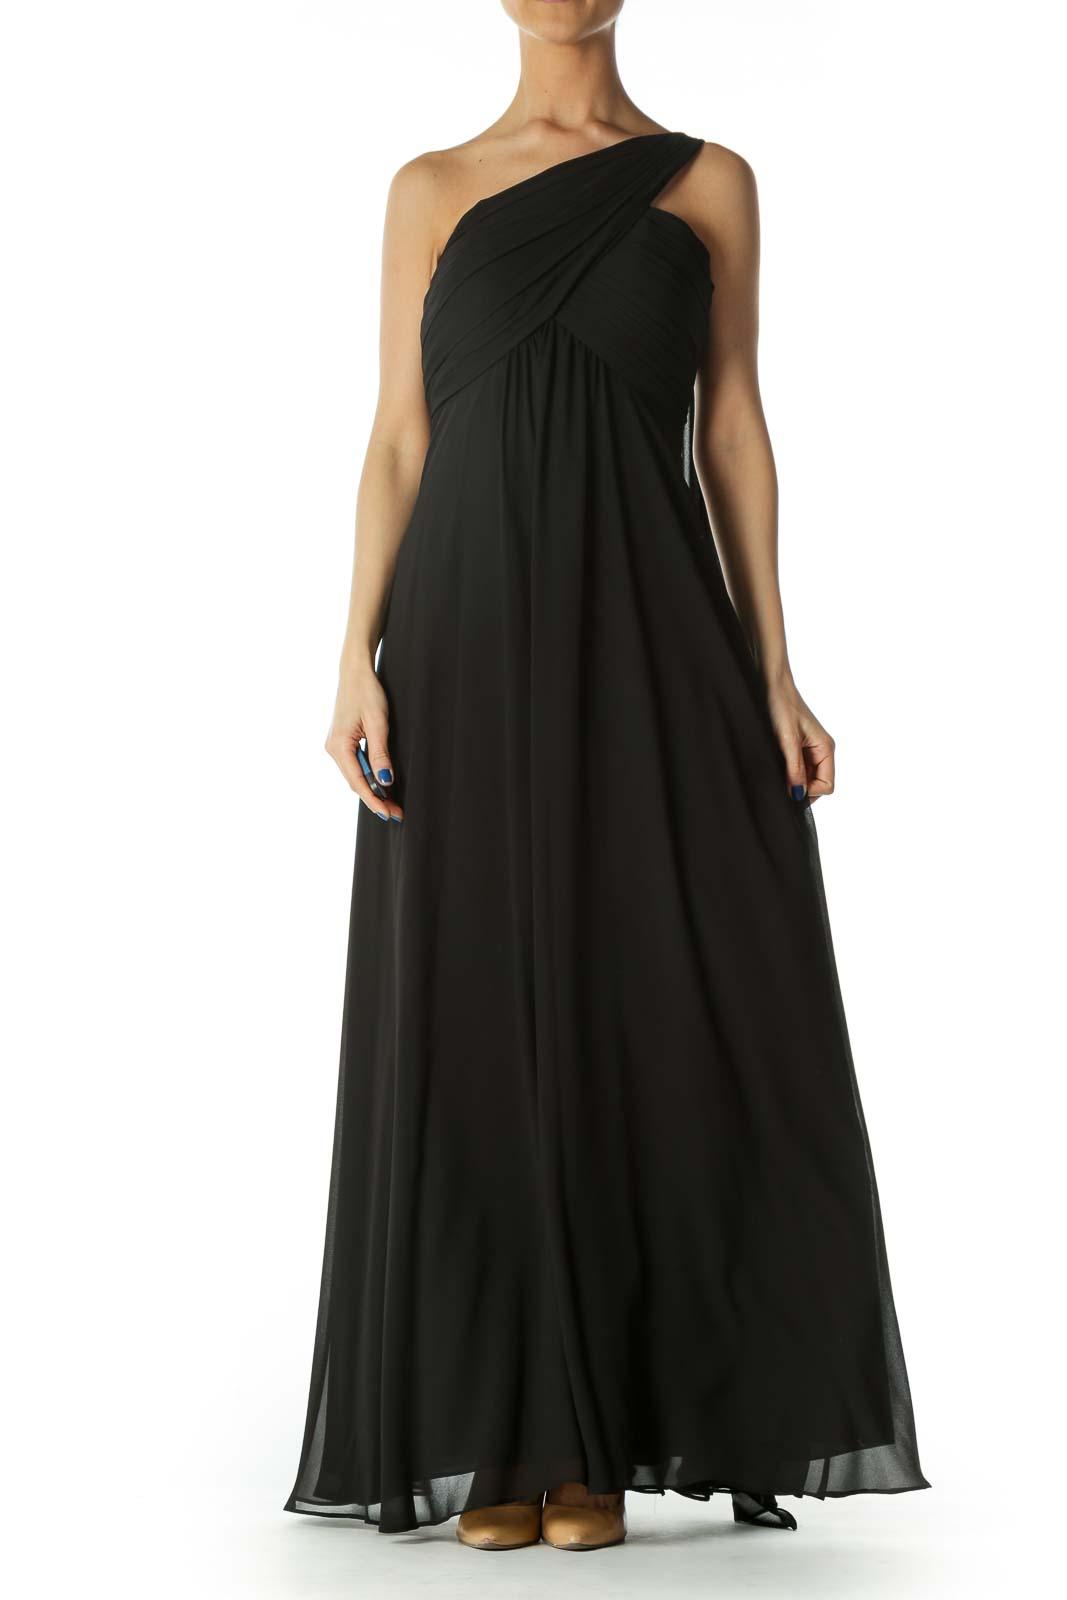 Black One Shoulder Evening Gown Front